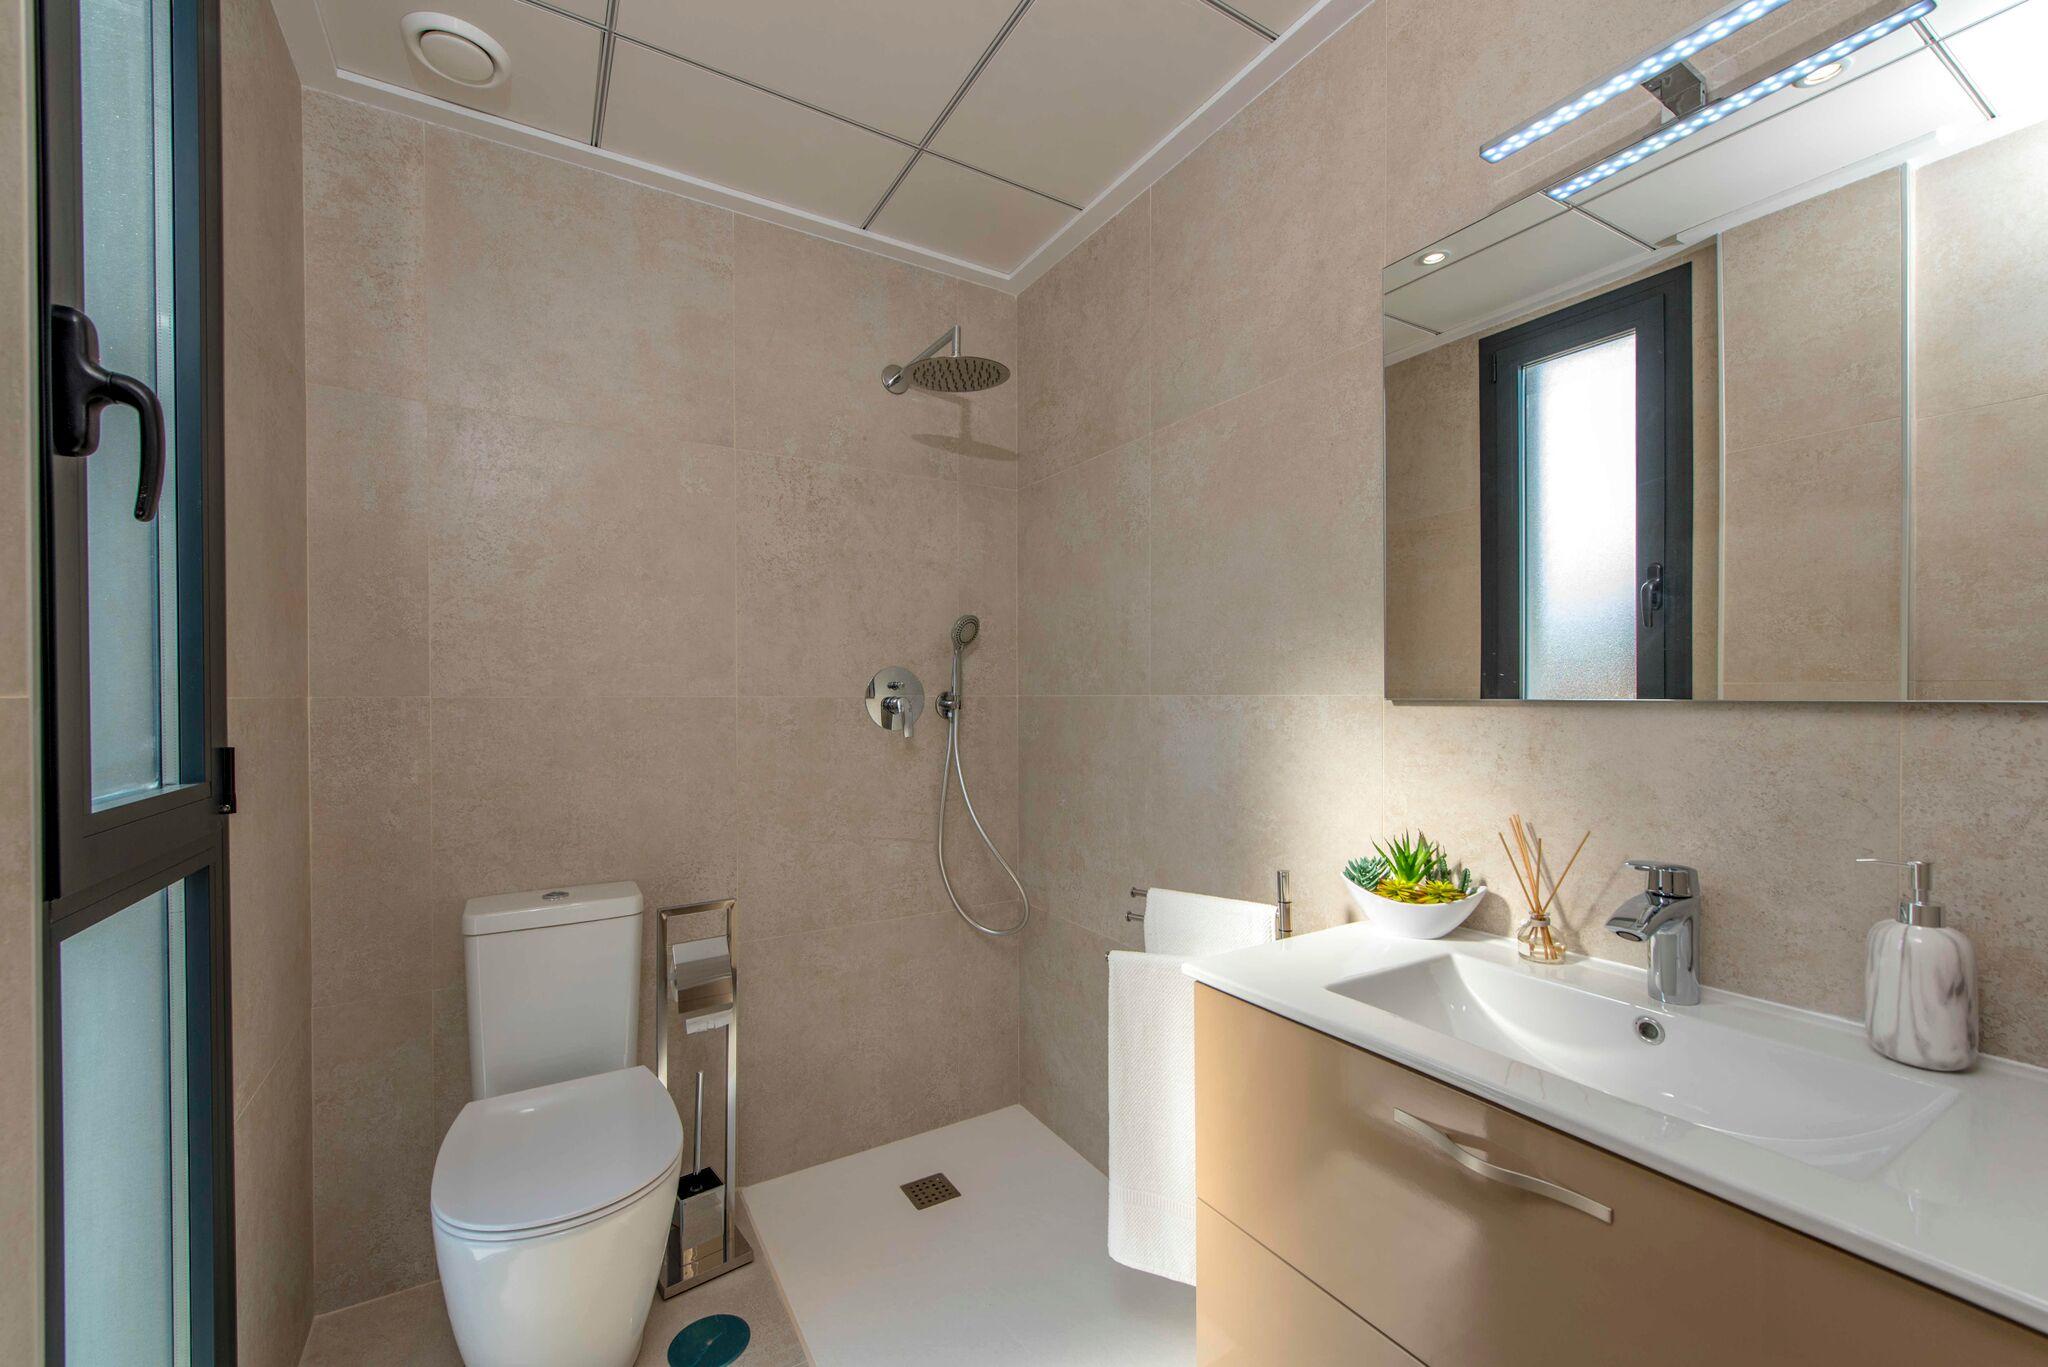 kf942785: Villa for sale in Villamartin